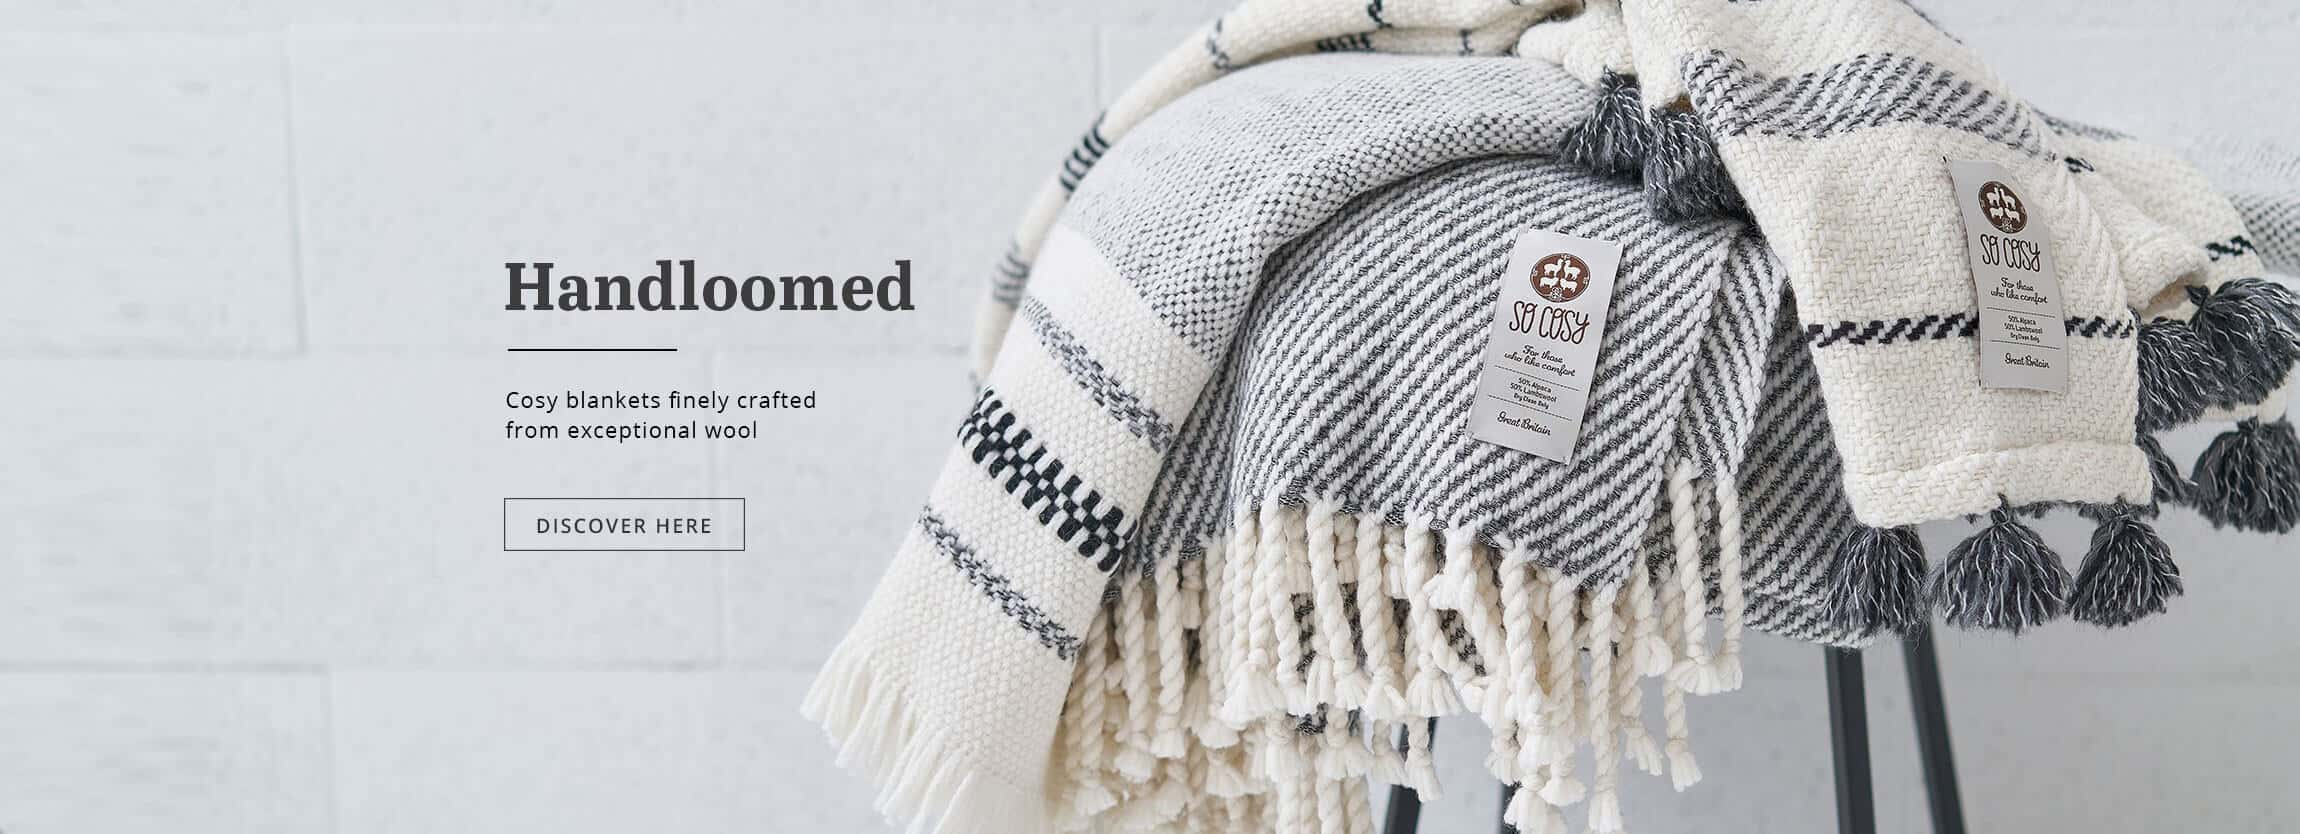 handloomed luxury blankets